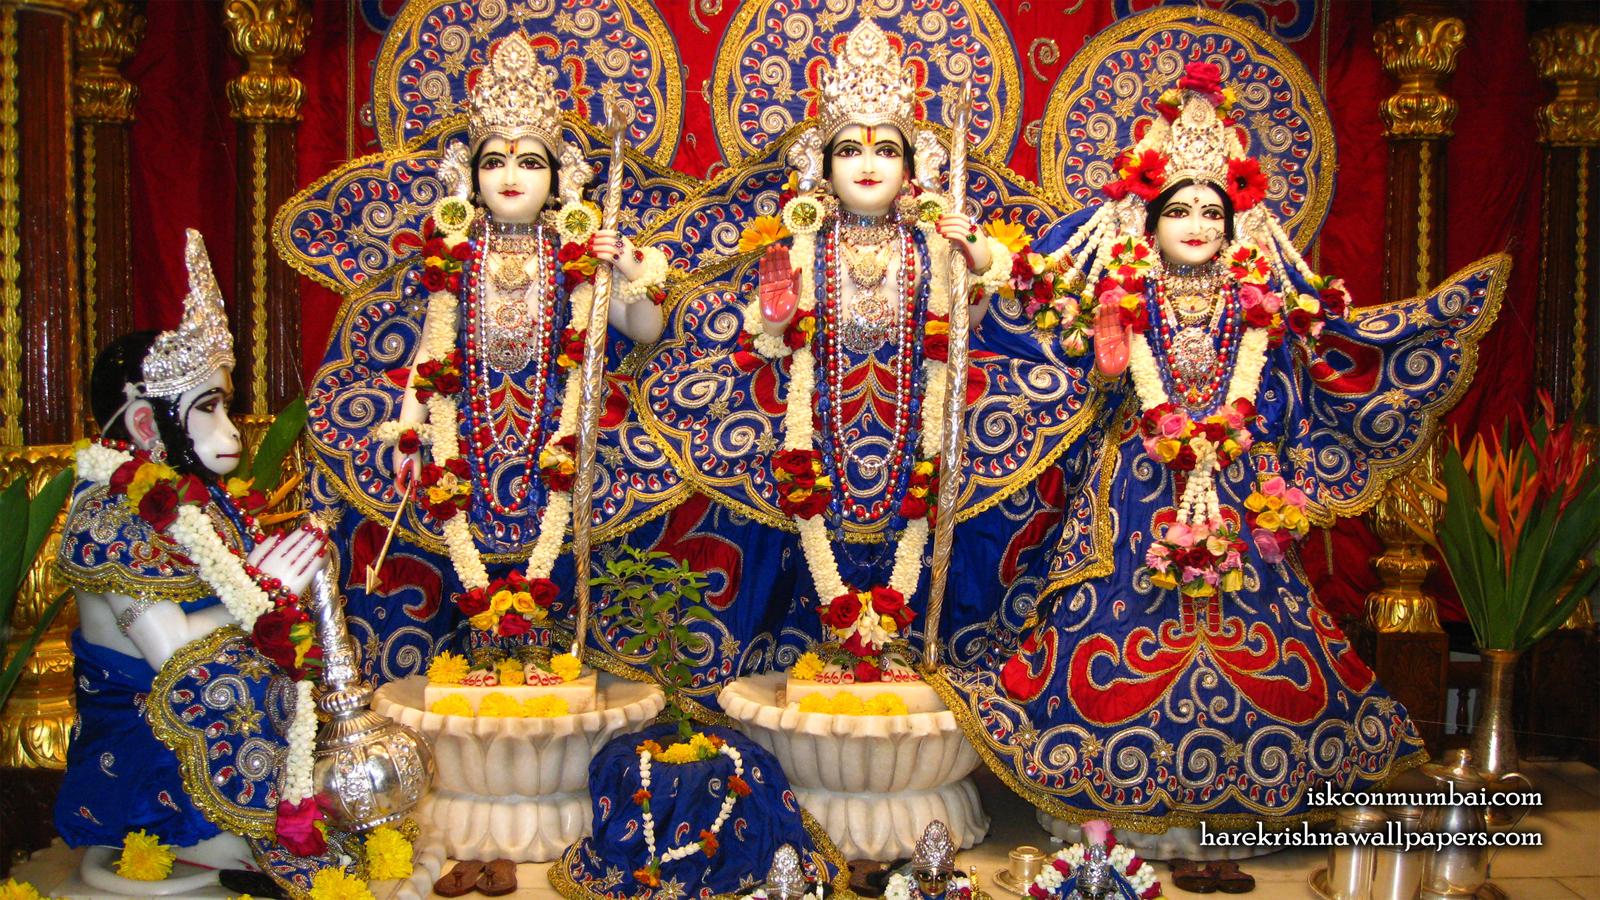 Sri Sri Sita Rama Laxman Hanuman Wallpaper (004) Size 1600x900 Download